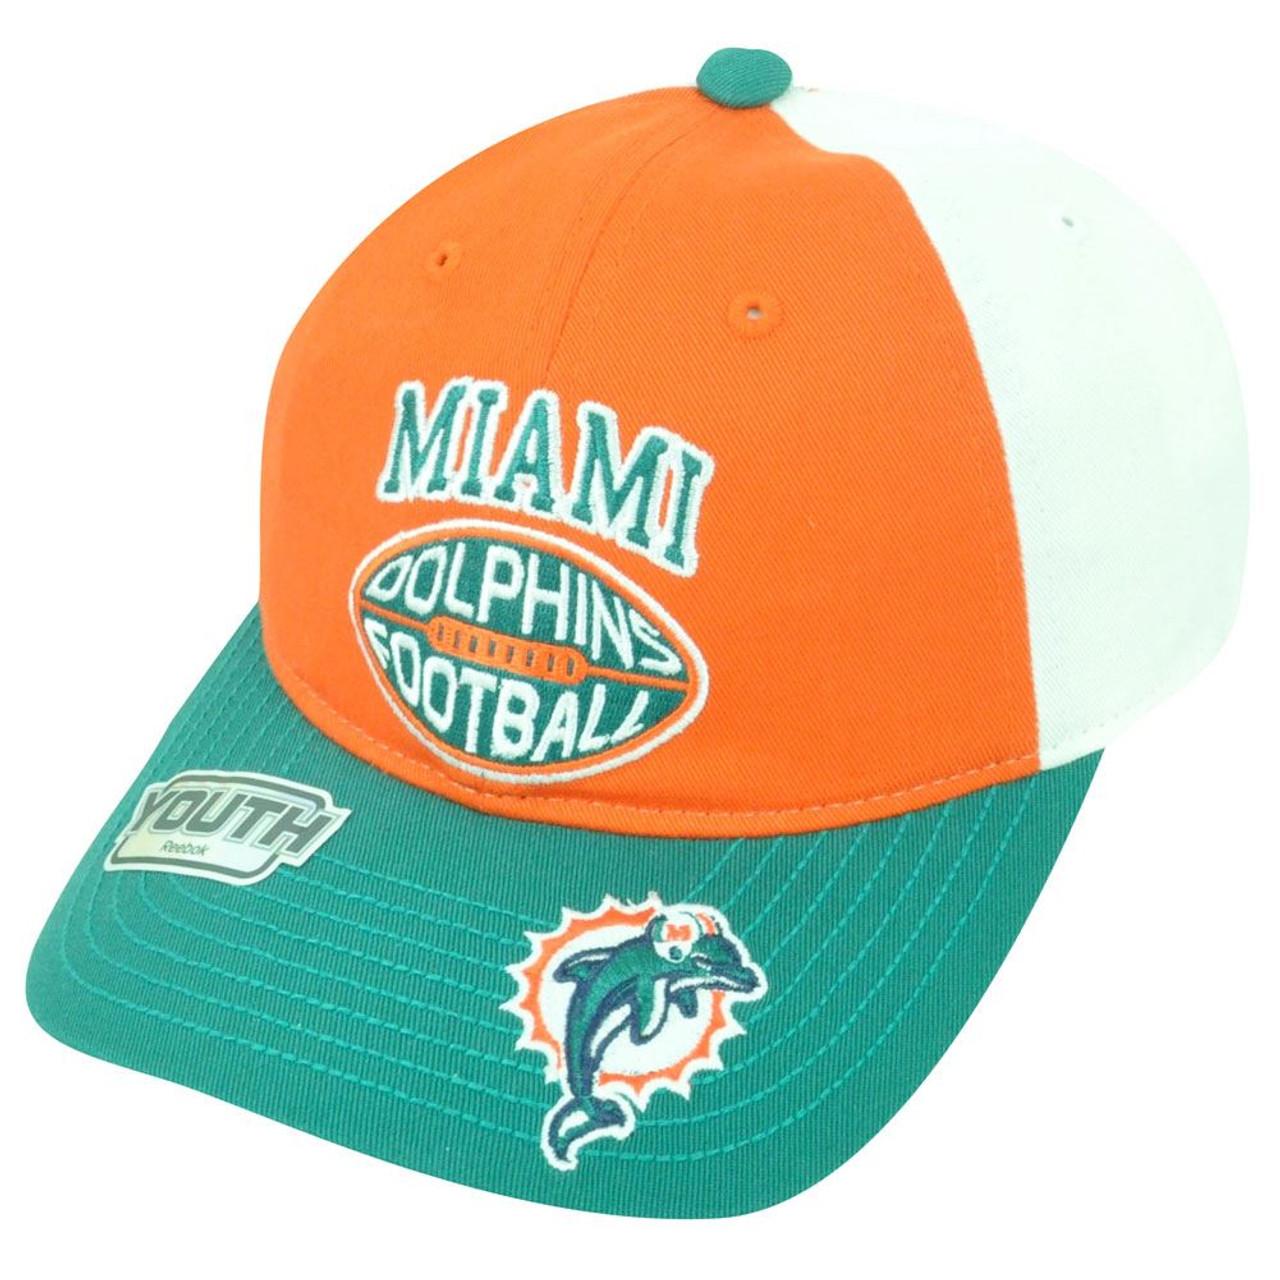 NFL Miami Dolphins Reebok Youth Adjustable Velcro Tricolor Orange Cap Hat  DH1675 - Sinbad Sports Store 3342b79d3